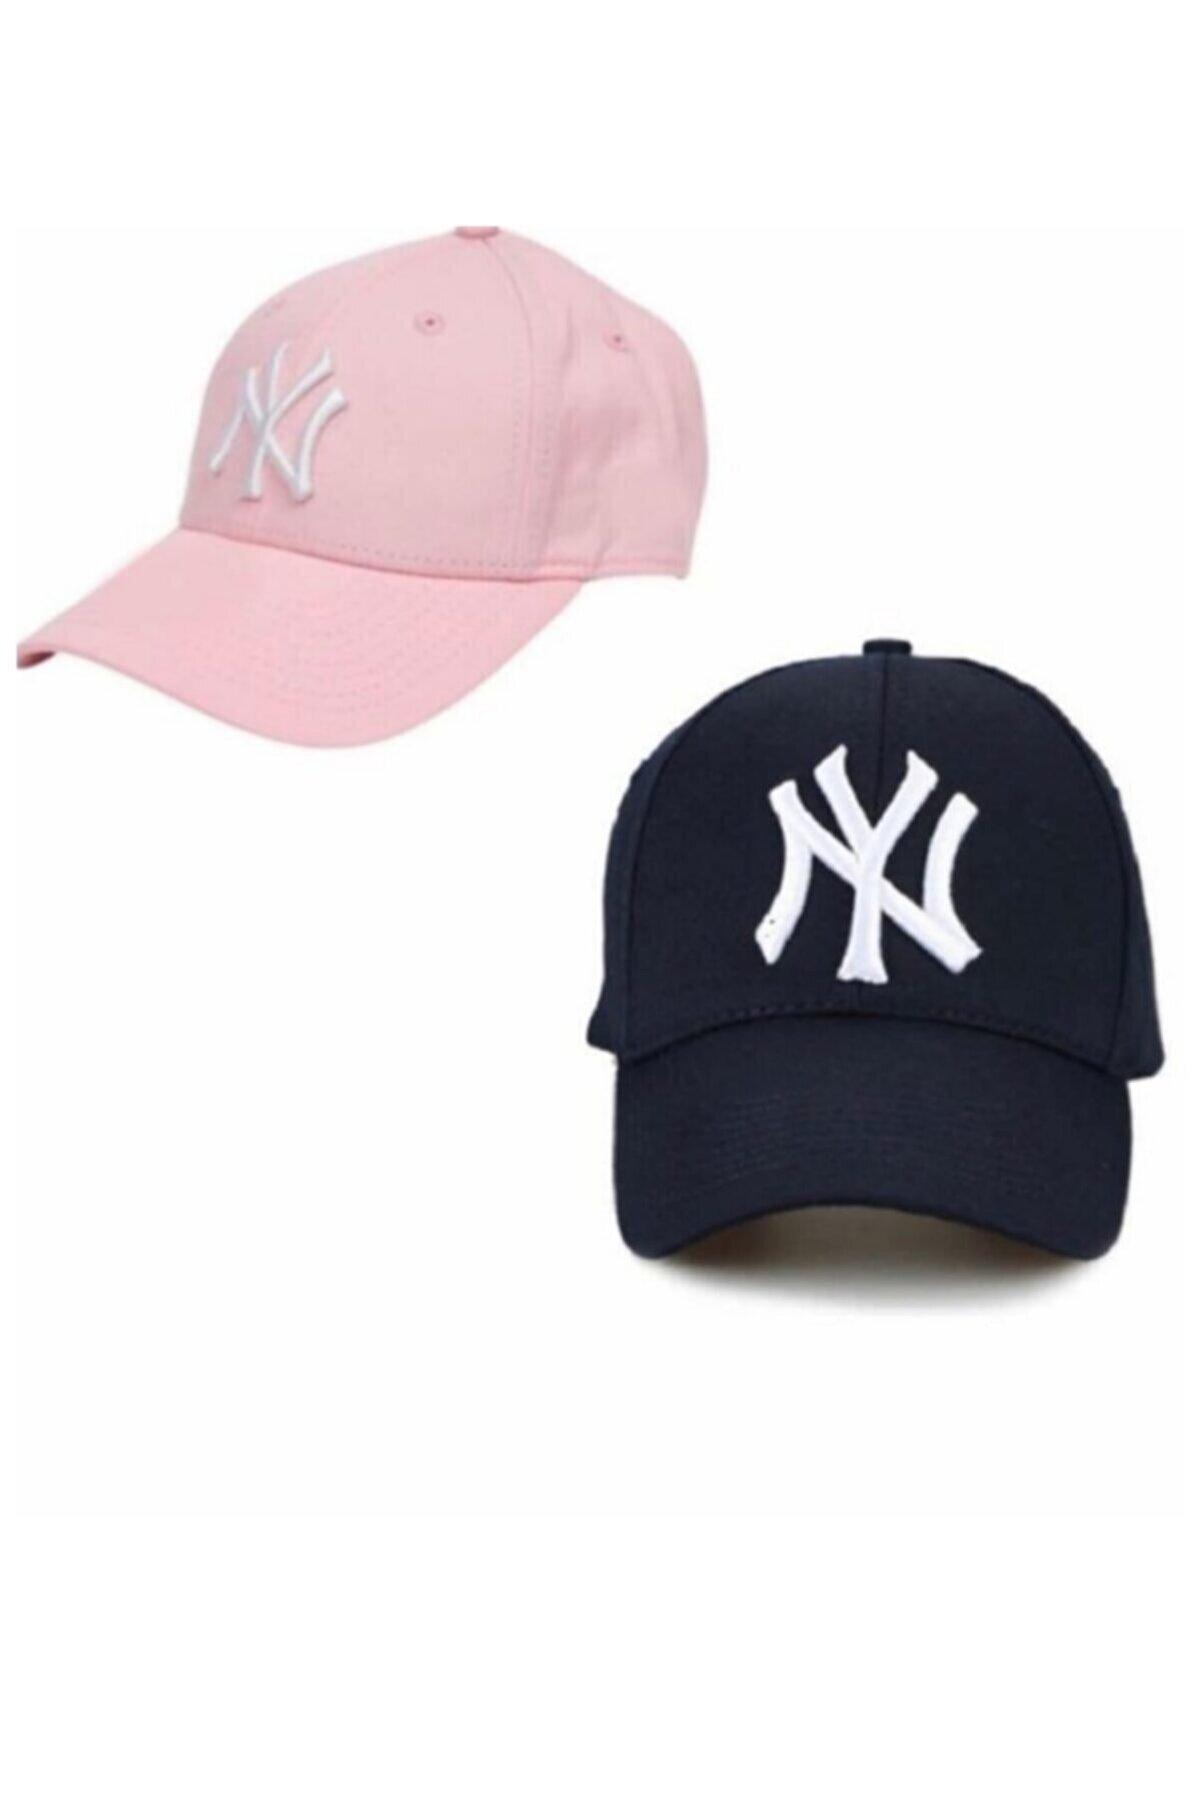 MaviMoure Unisex 2*li Paket Şapka